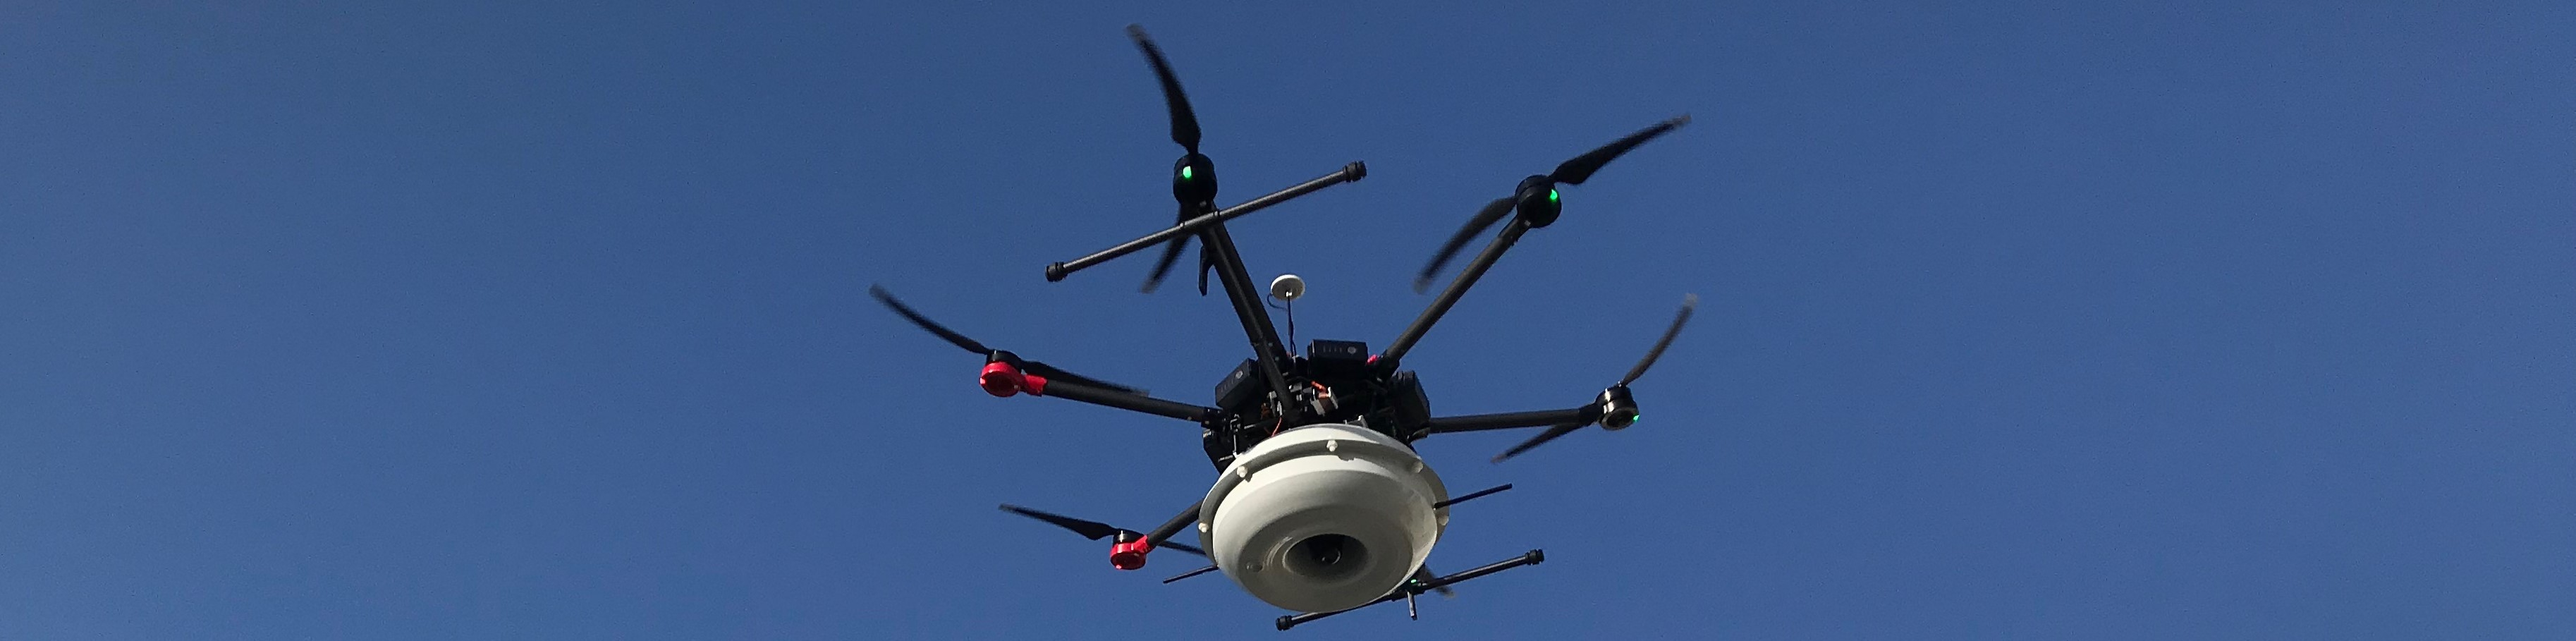 Drone Electronic Siren wide sky